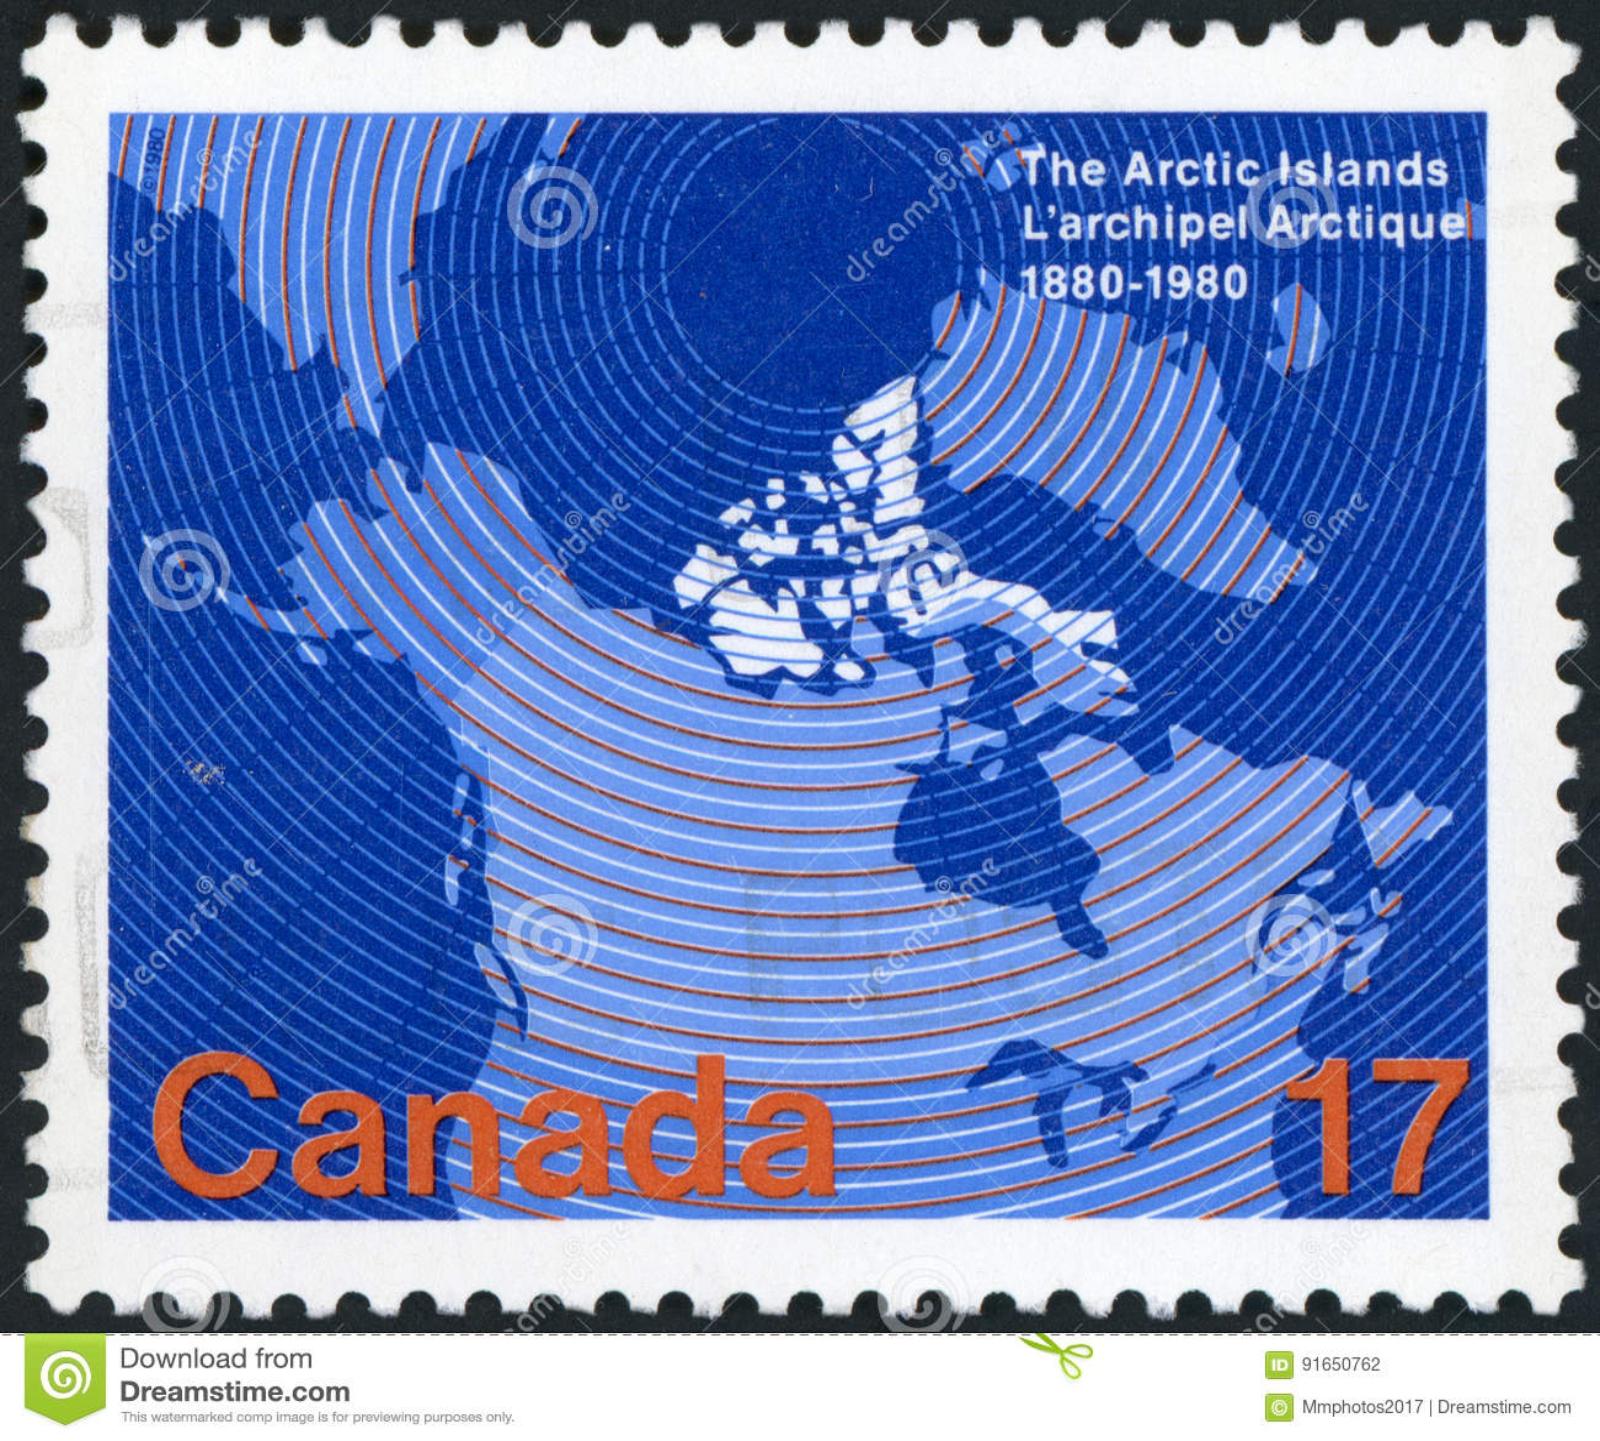 Postage stamp stock photo  Image of philatelic, stamps